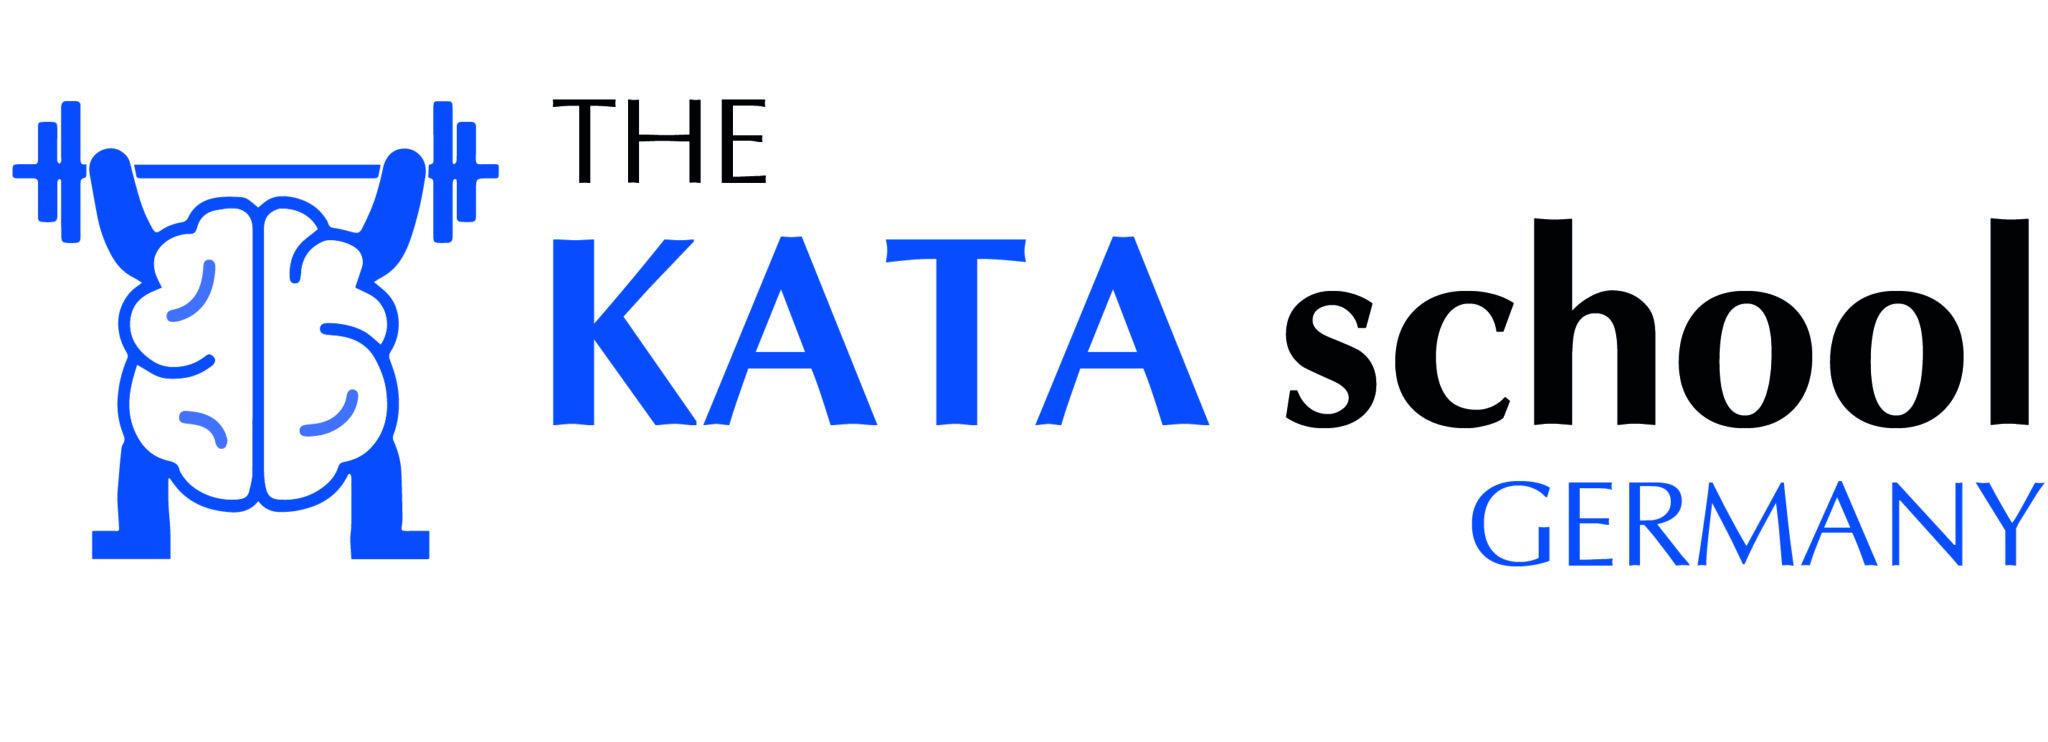 KATA School Germany